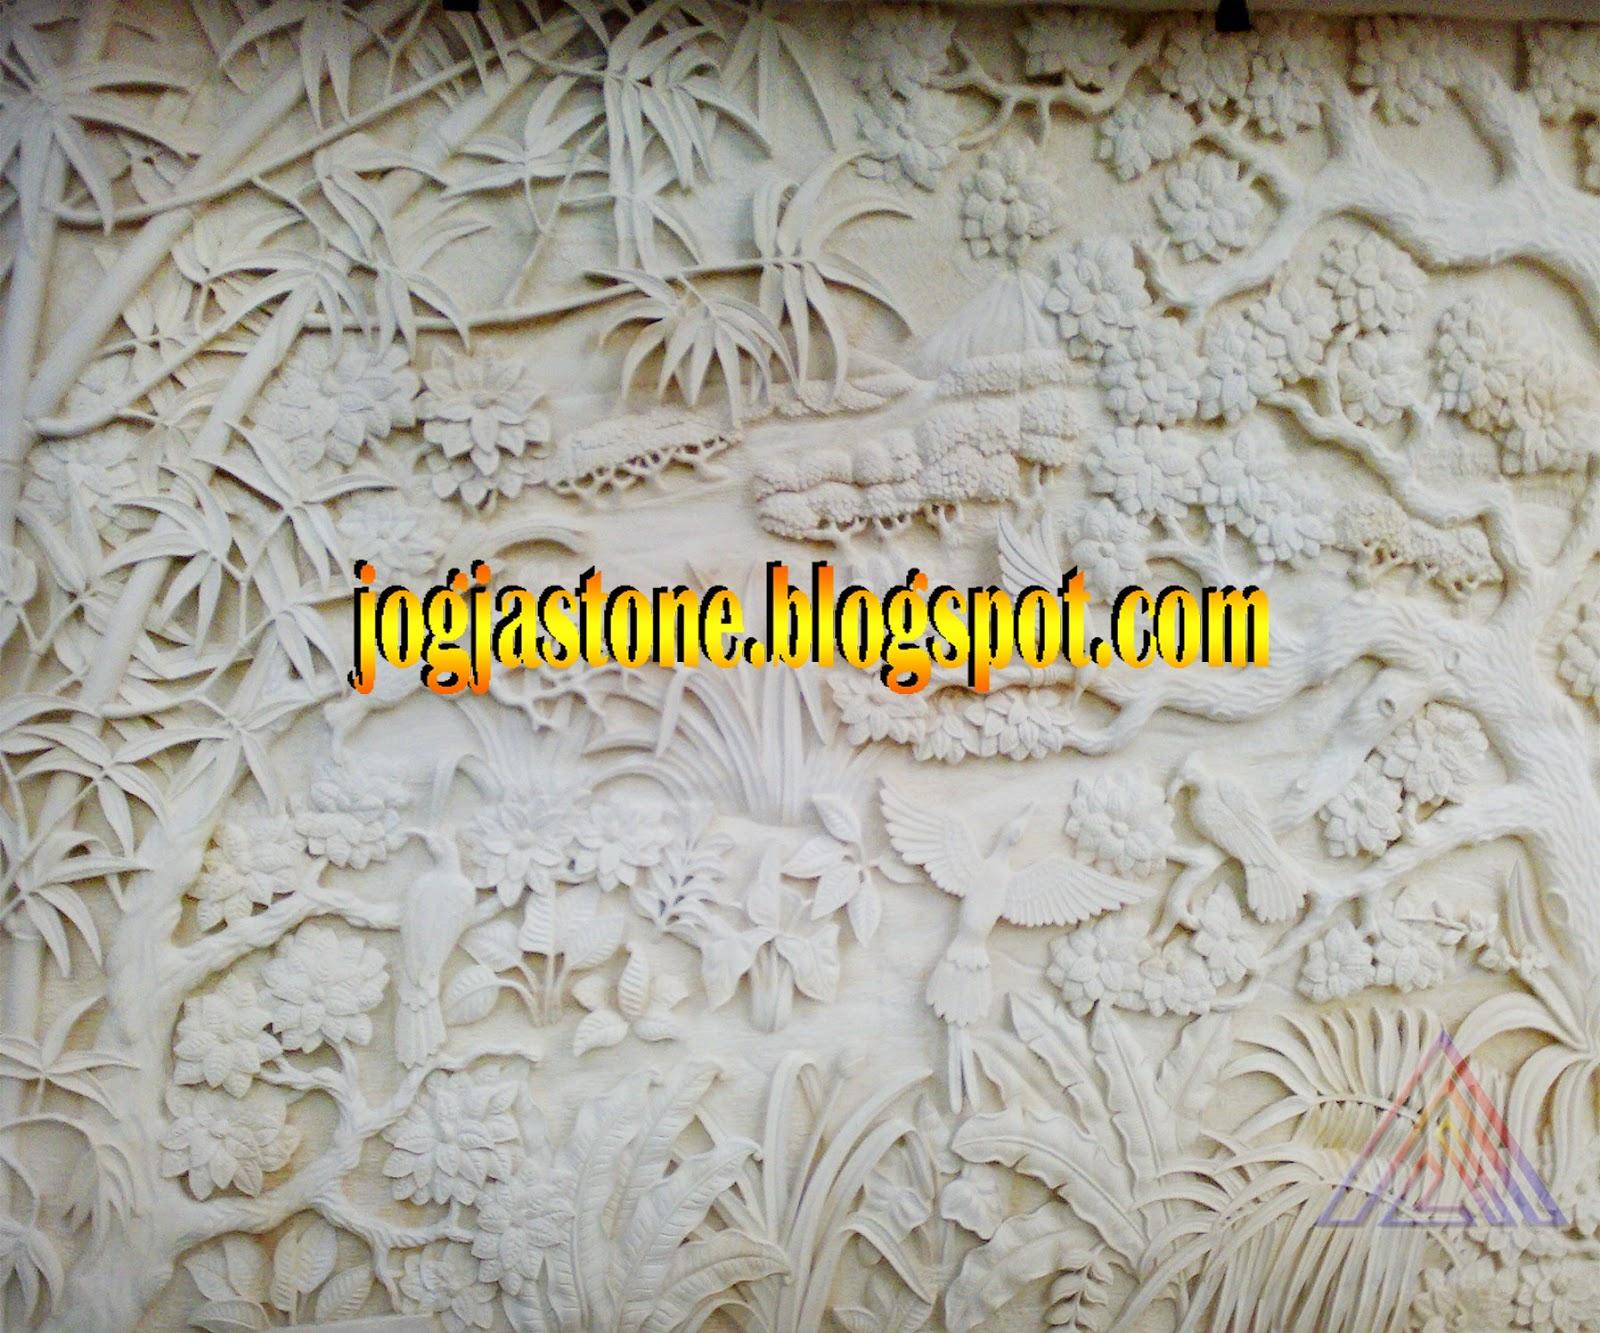 relief kerajinan ukir batu alam paras jogja batu putih